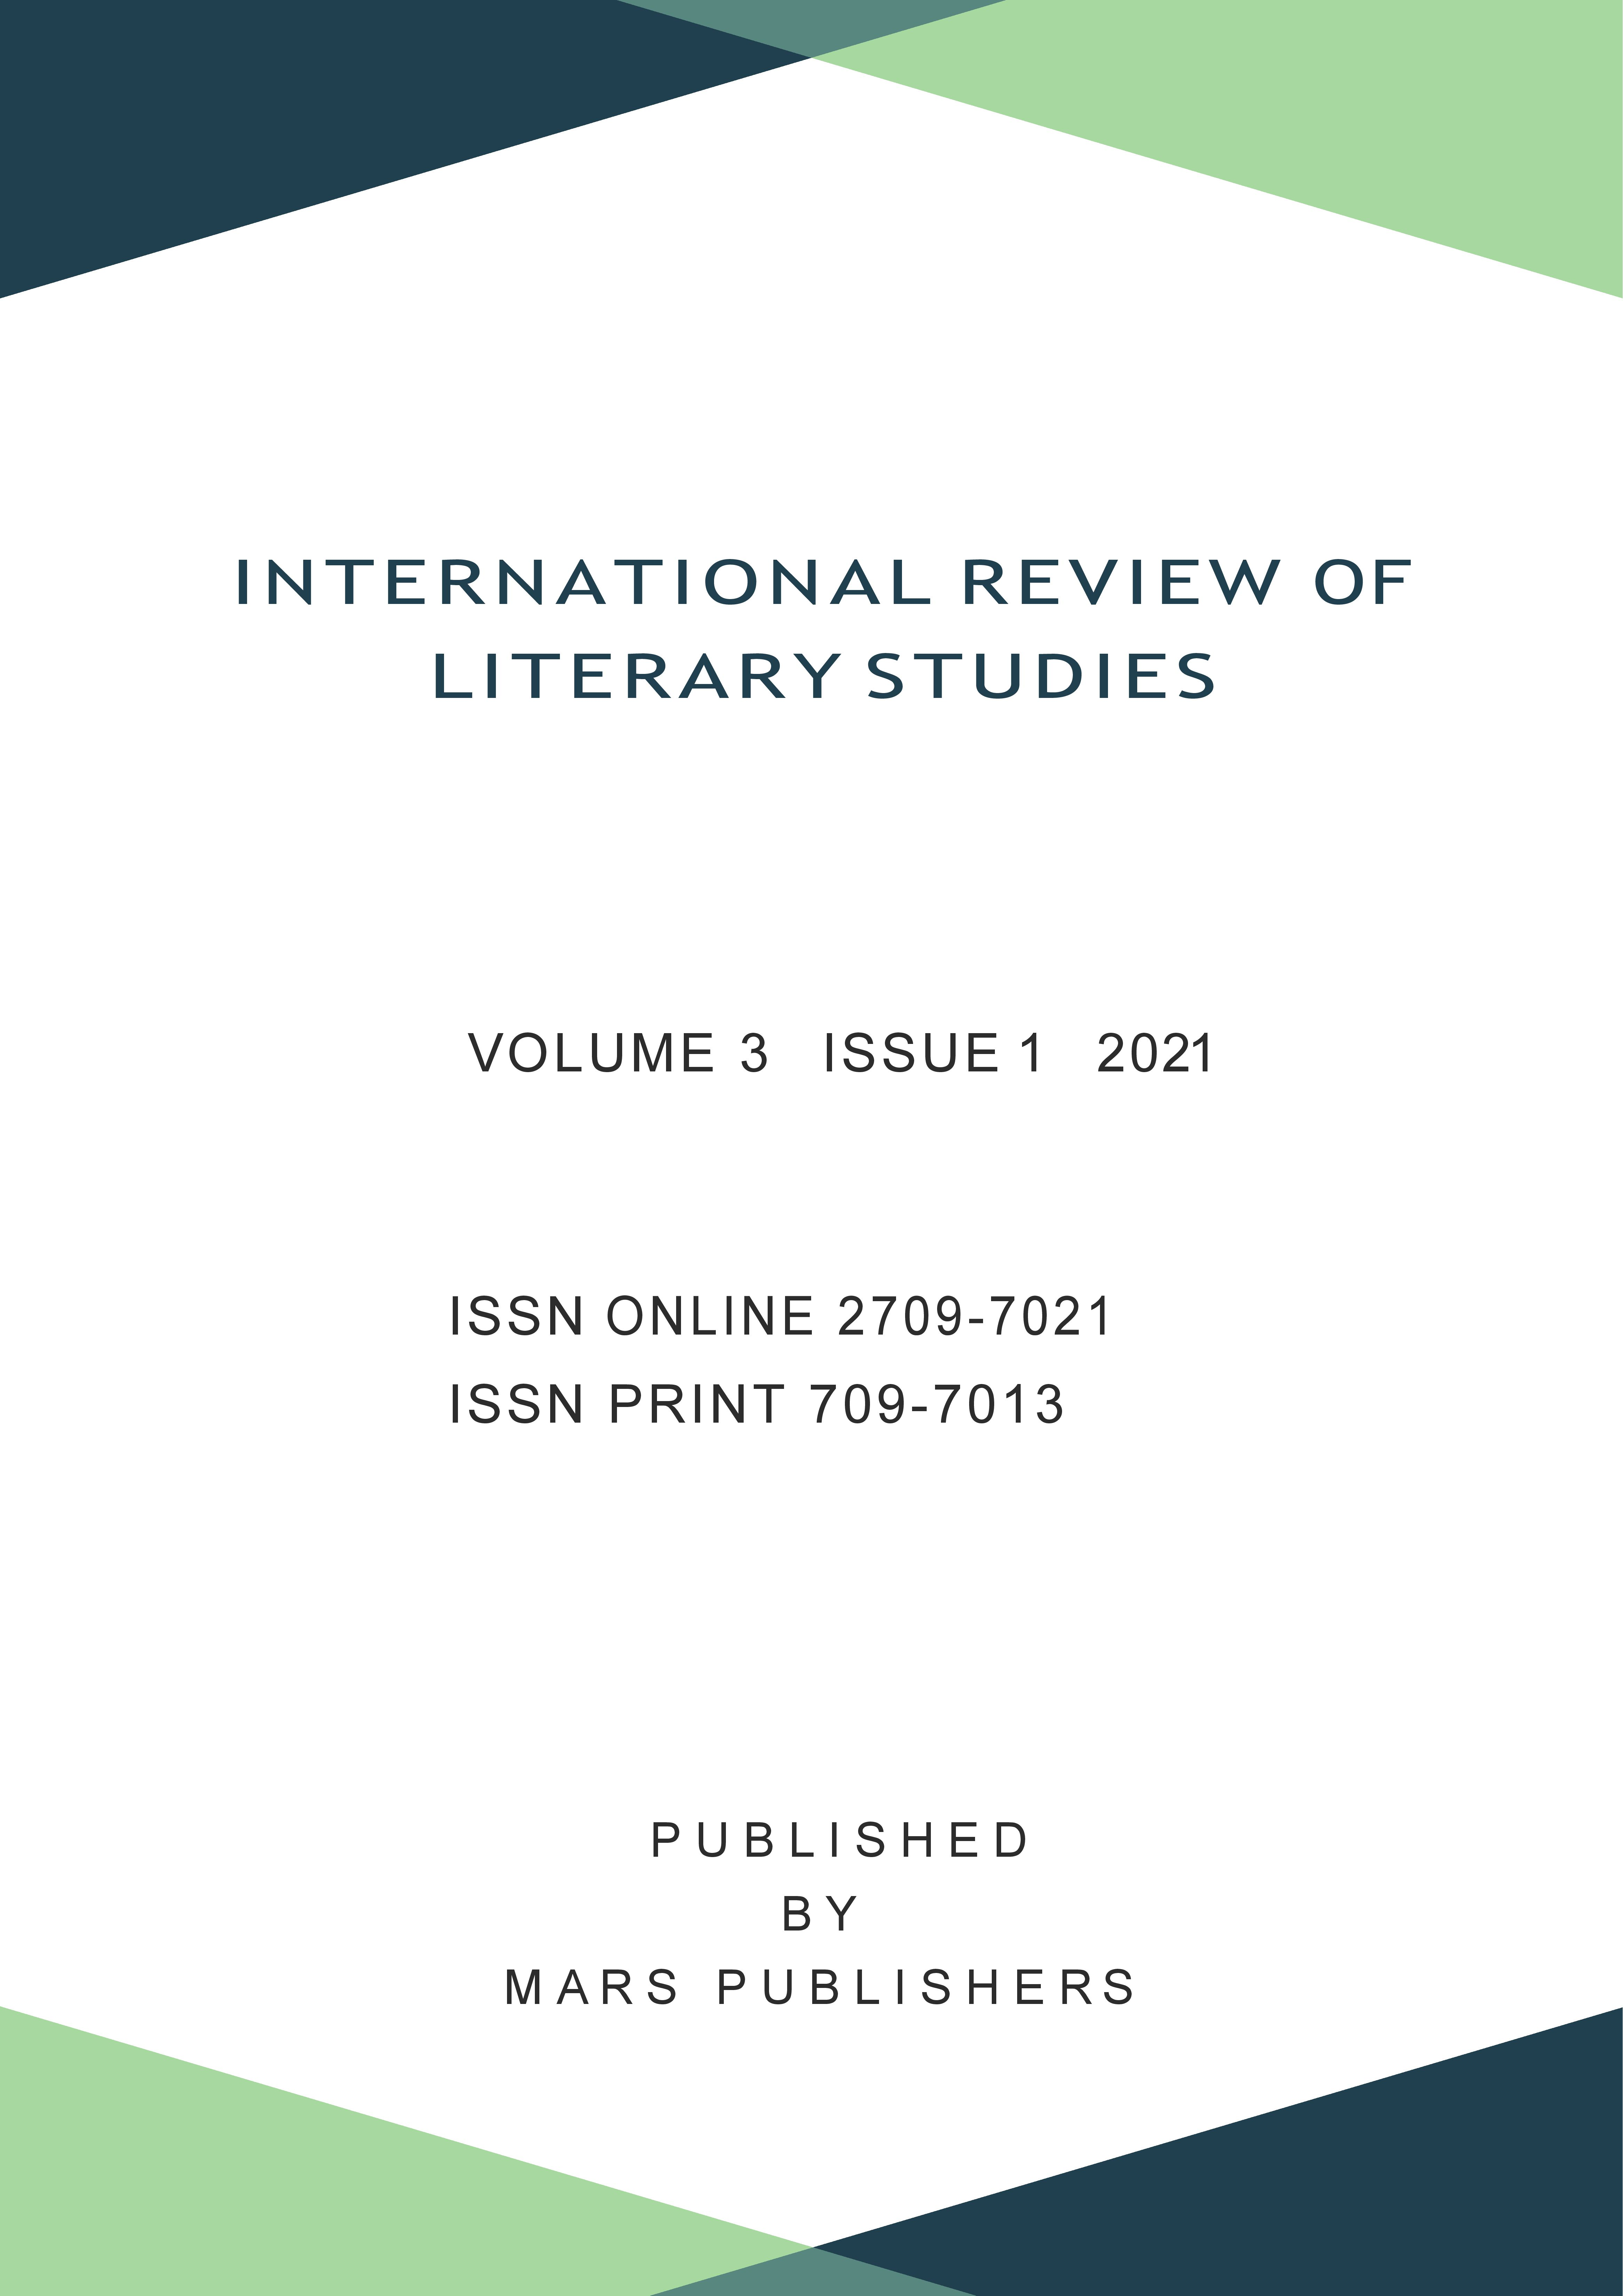 View Vol. 3 No. 1 (2021): IRLS-International Review of Literary Studies